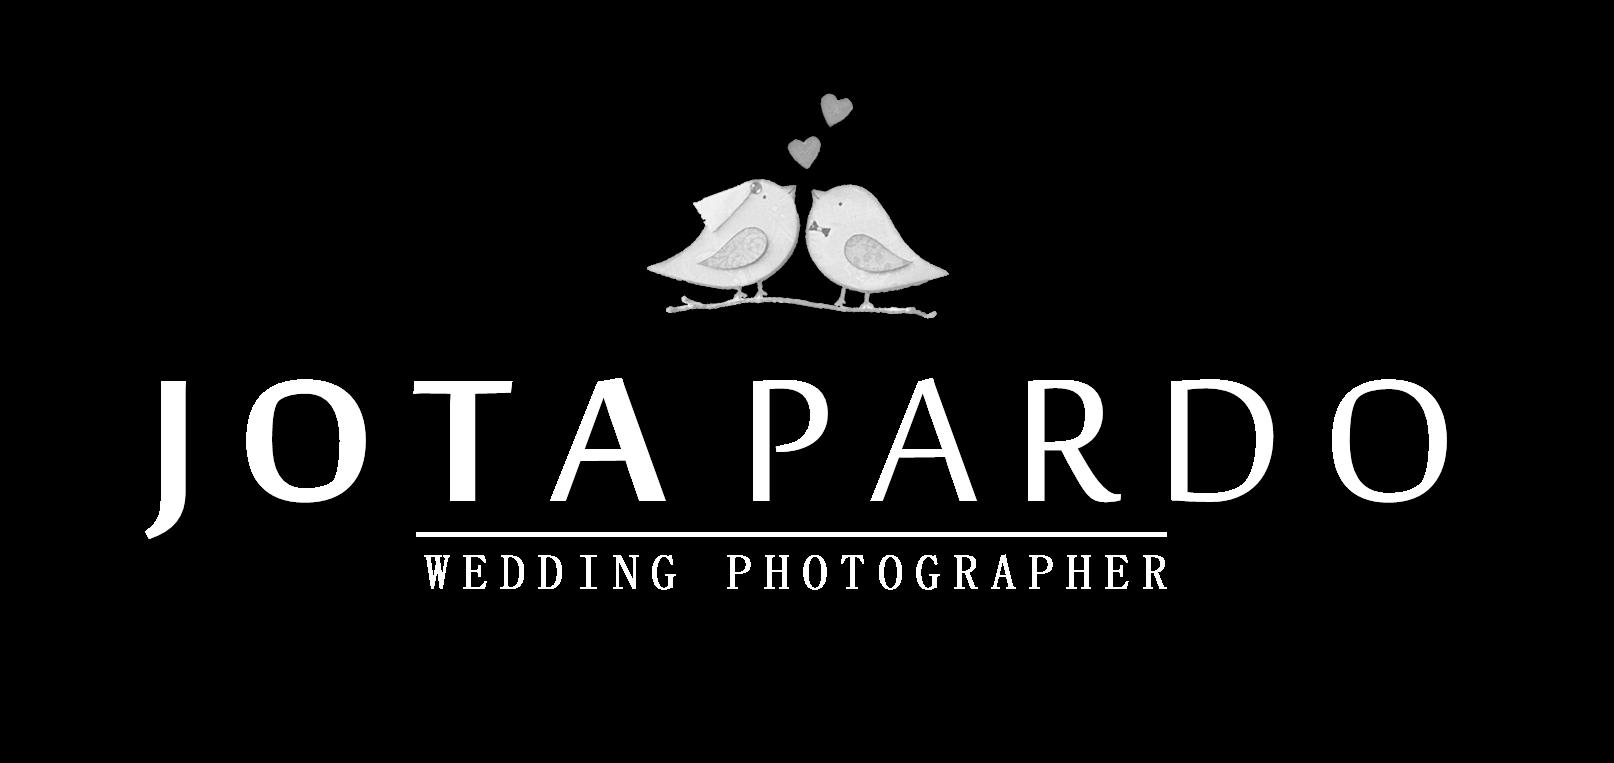 Jota Pardo | Fotografía de Bodas en Medellín, Bodas Adventistas, Fotógrafo de matrimonios, Adventist Wedding Photography